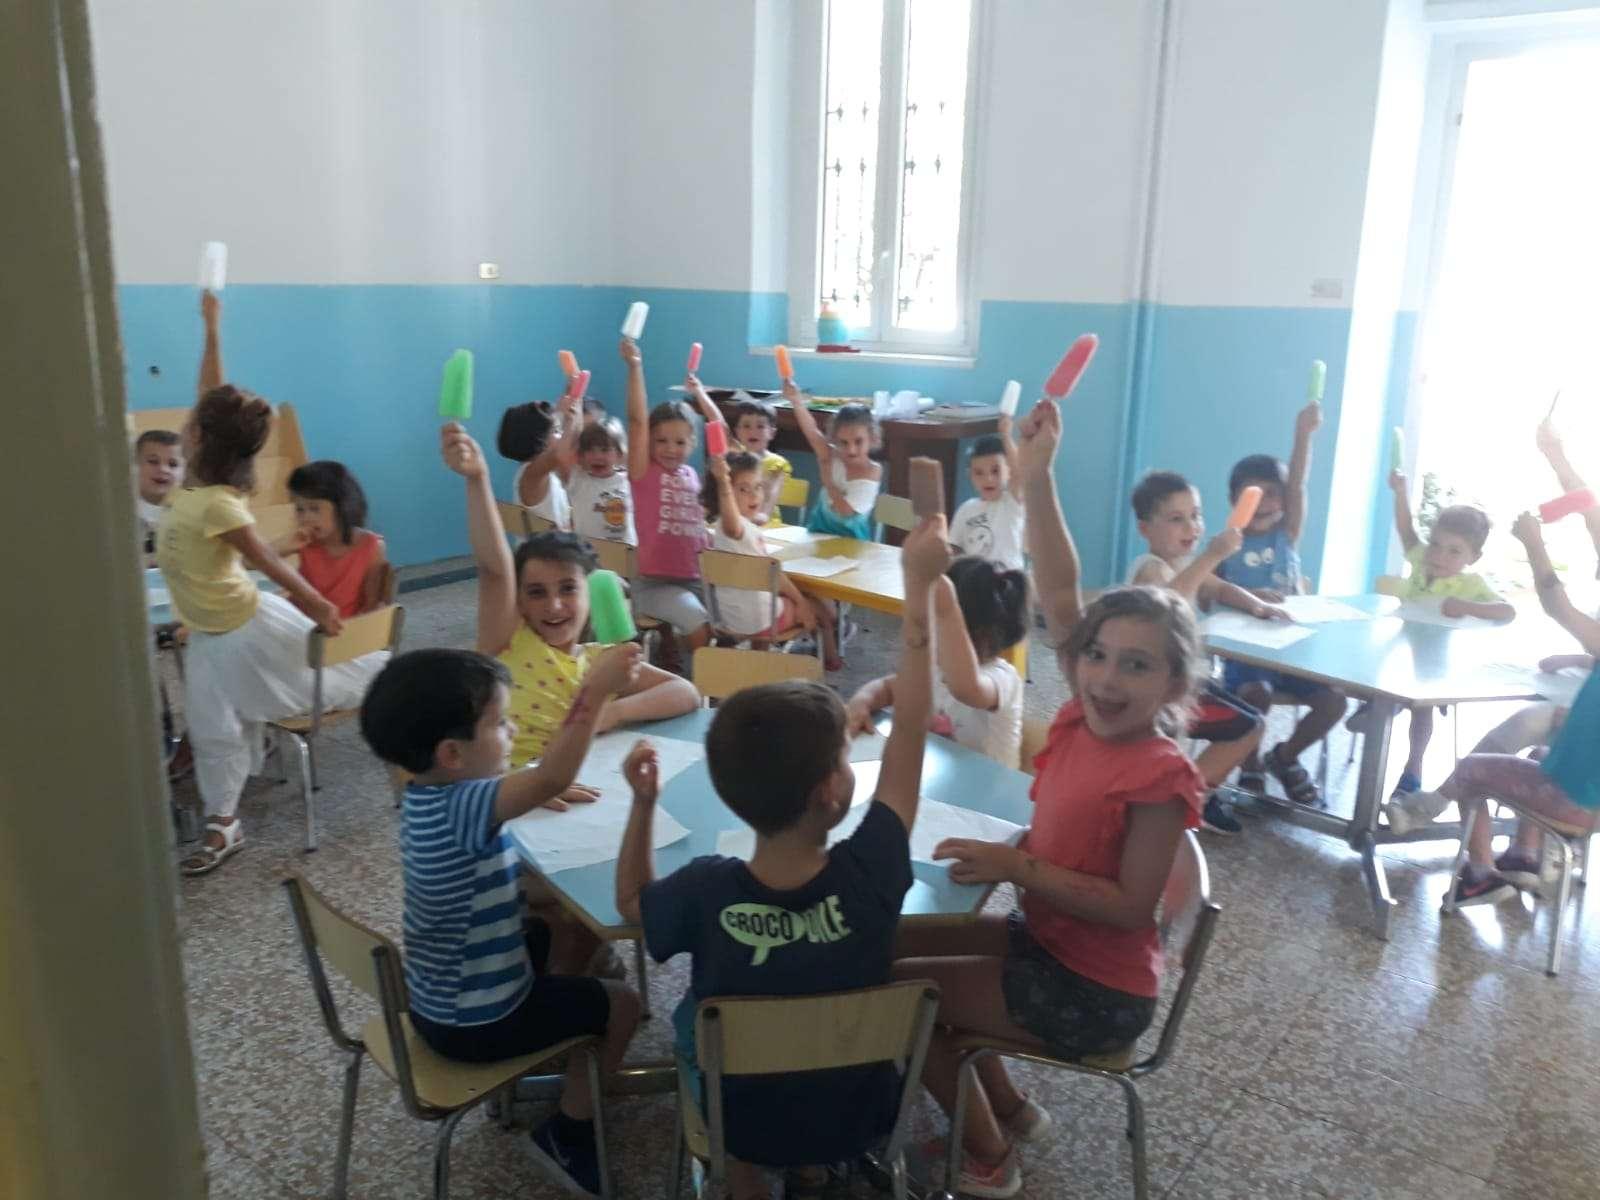 IMG 20190803 WA0040 - Scuola Materna Peschiera Borromeo